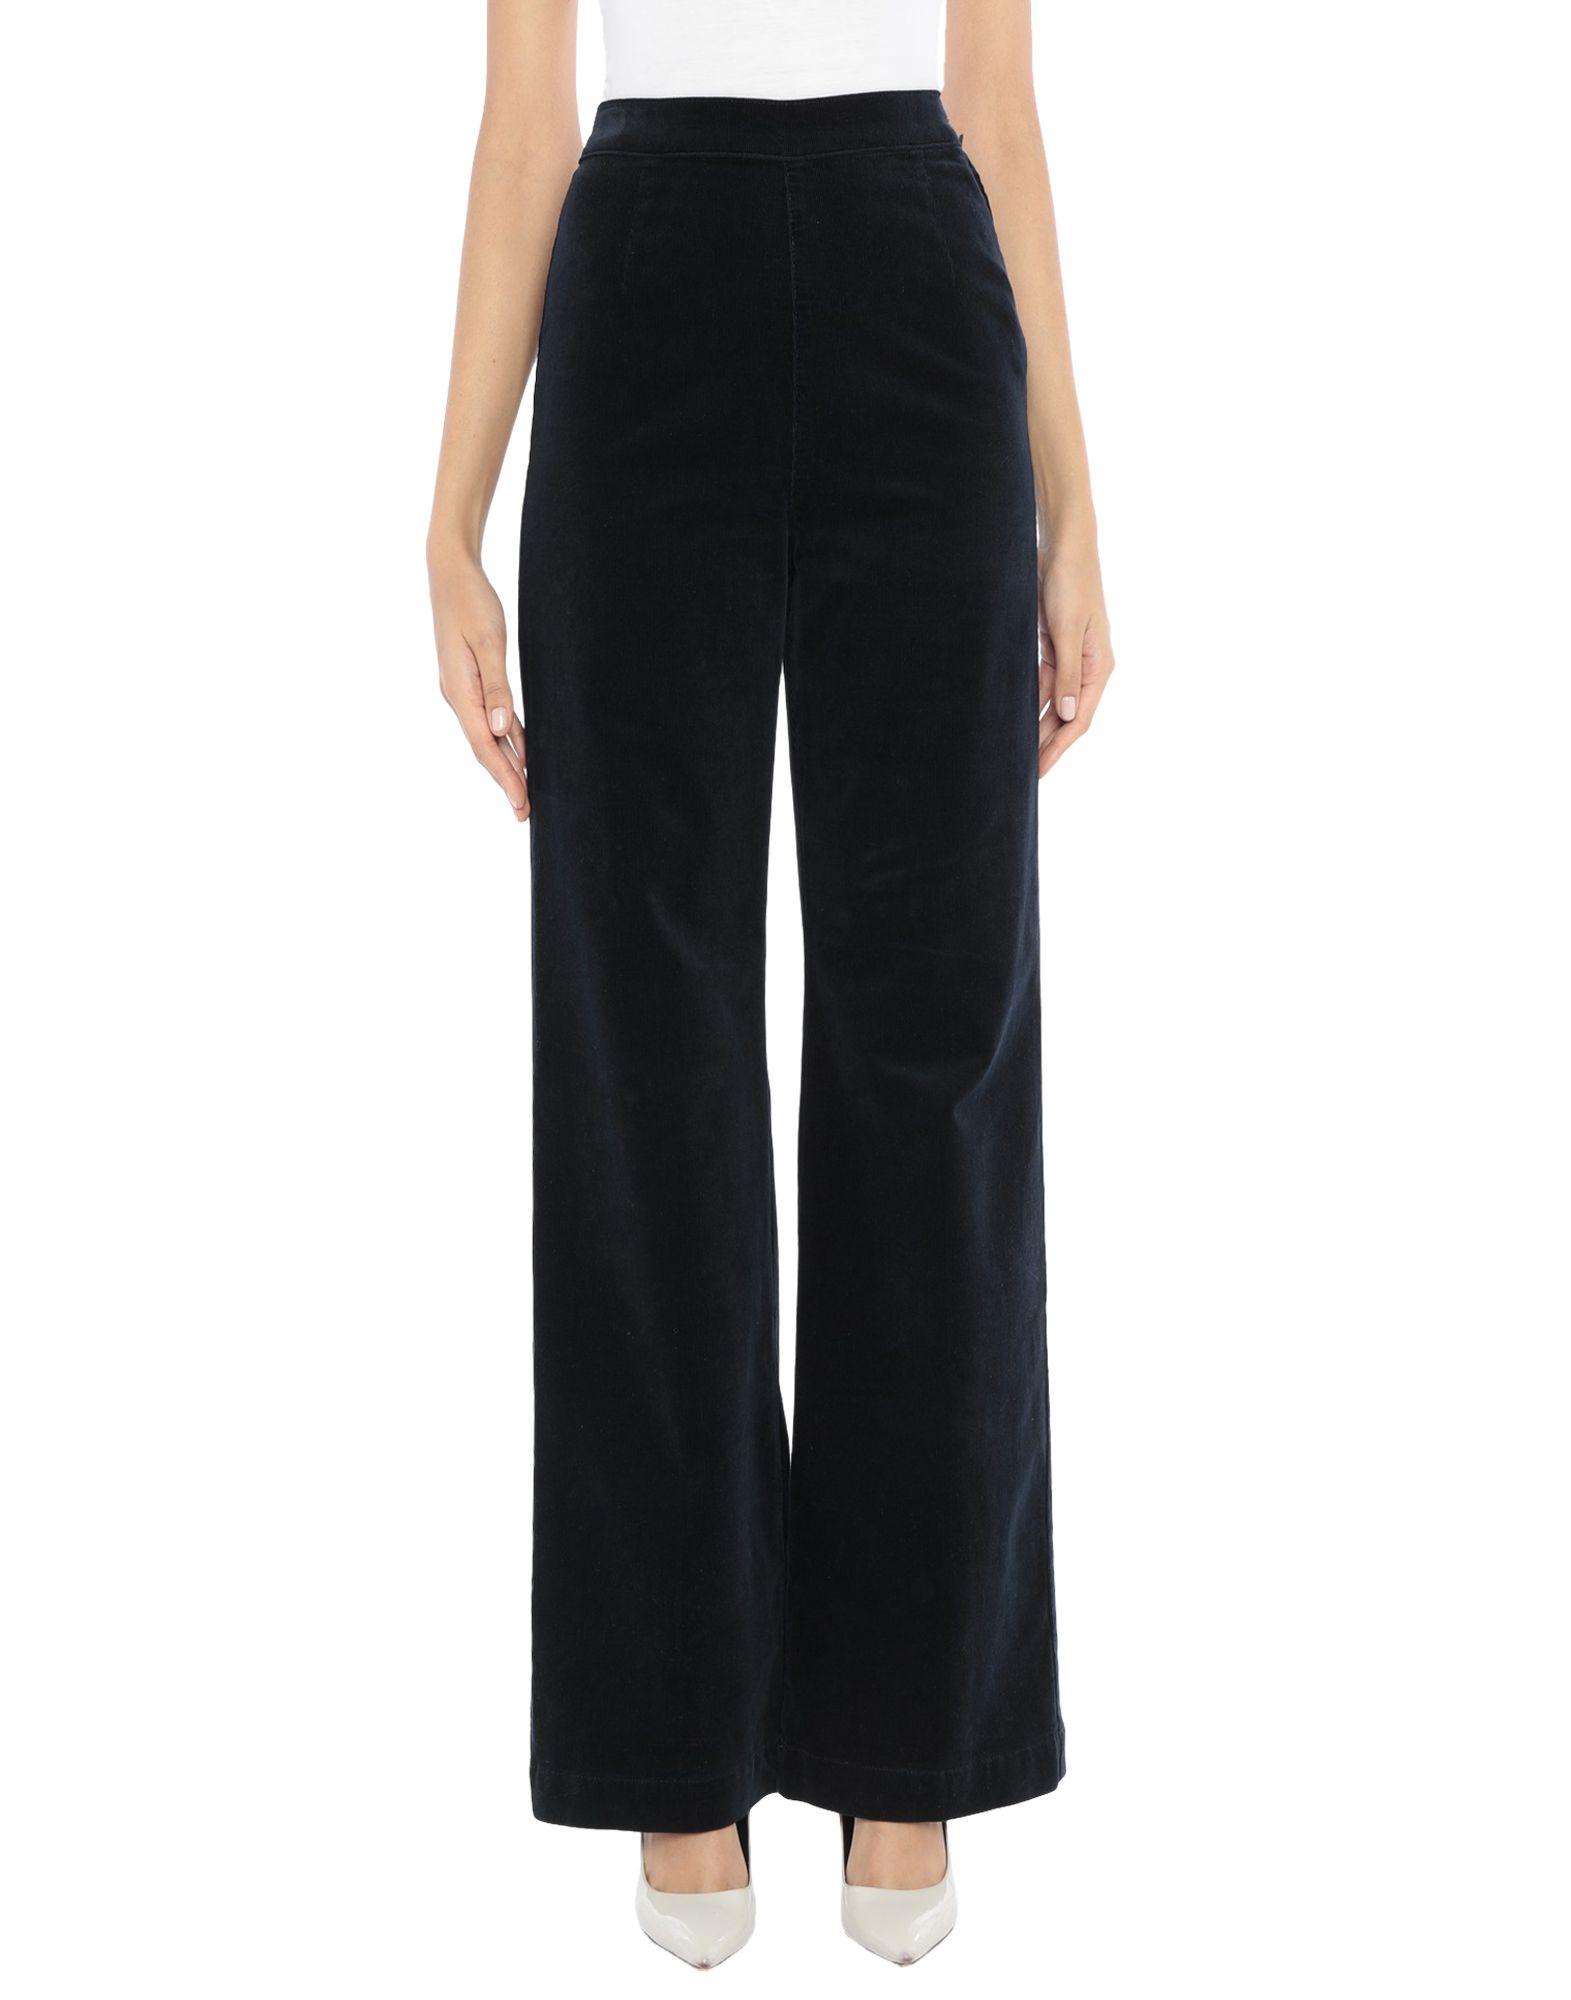 ALEXA CHUNG for AG Jeans Повседневные брюки